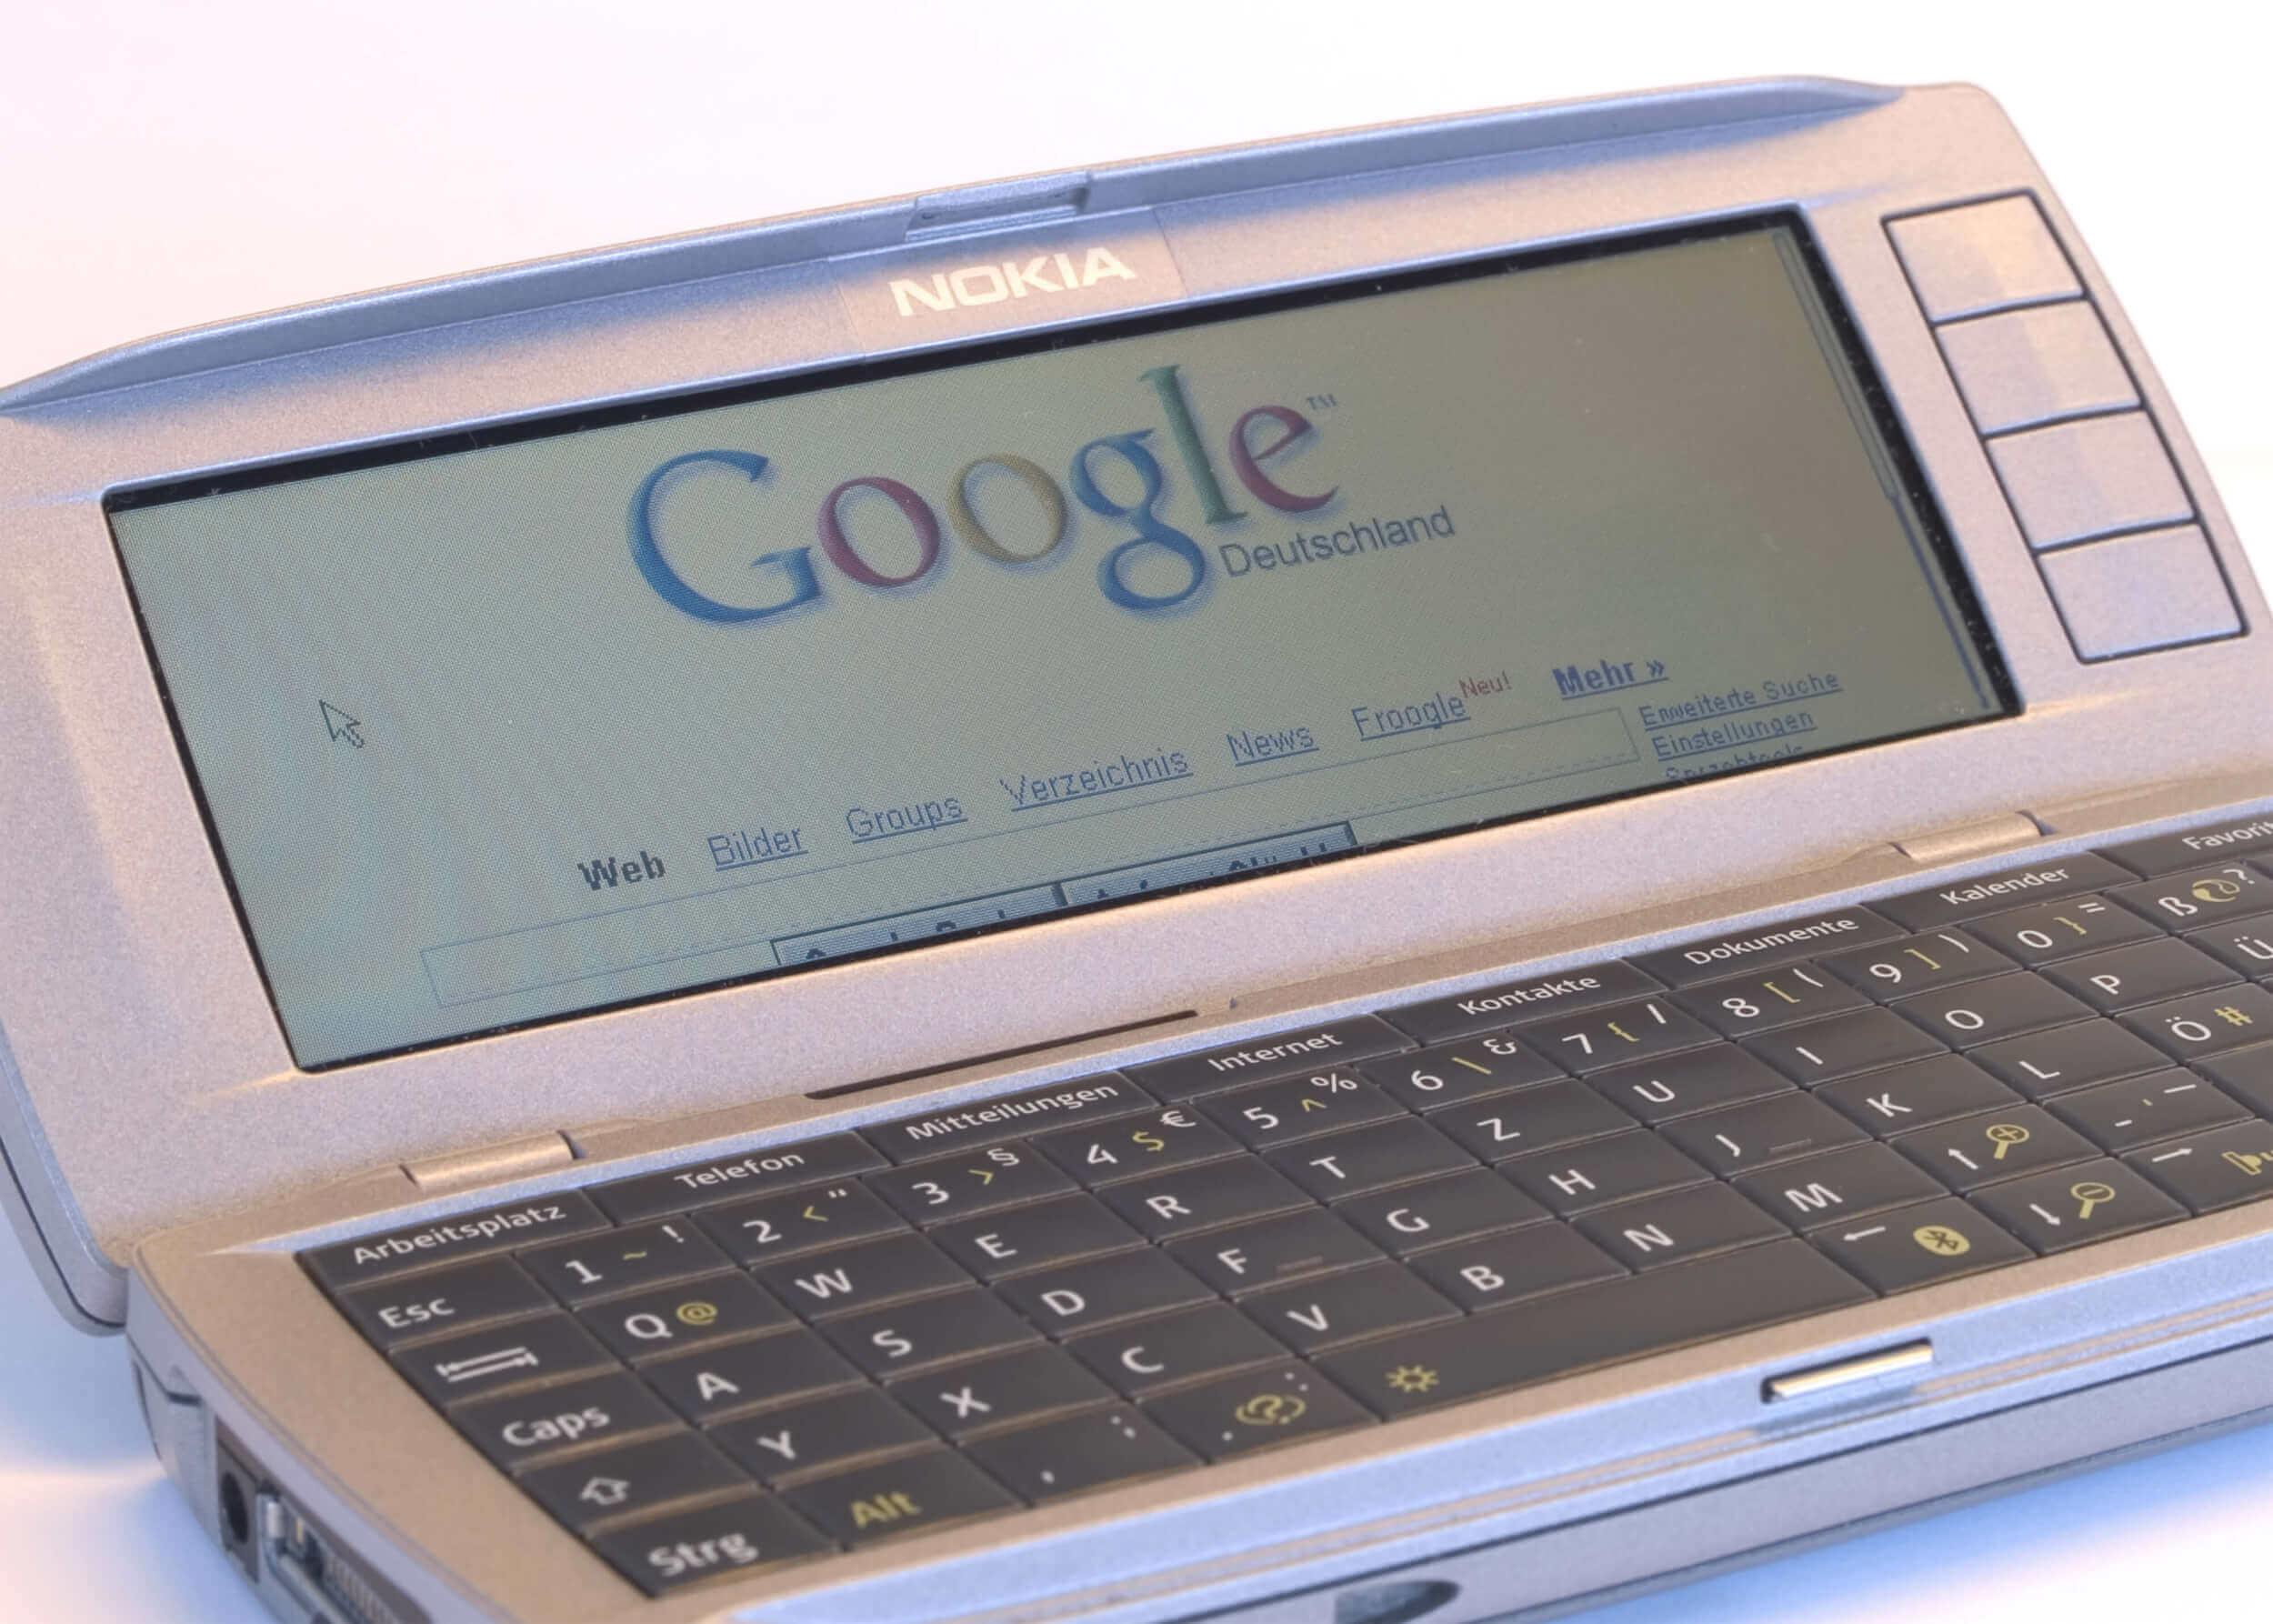 Handy mit Google Suche auf Display (c) dANCE-pHOTOS.de / pixelio.de